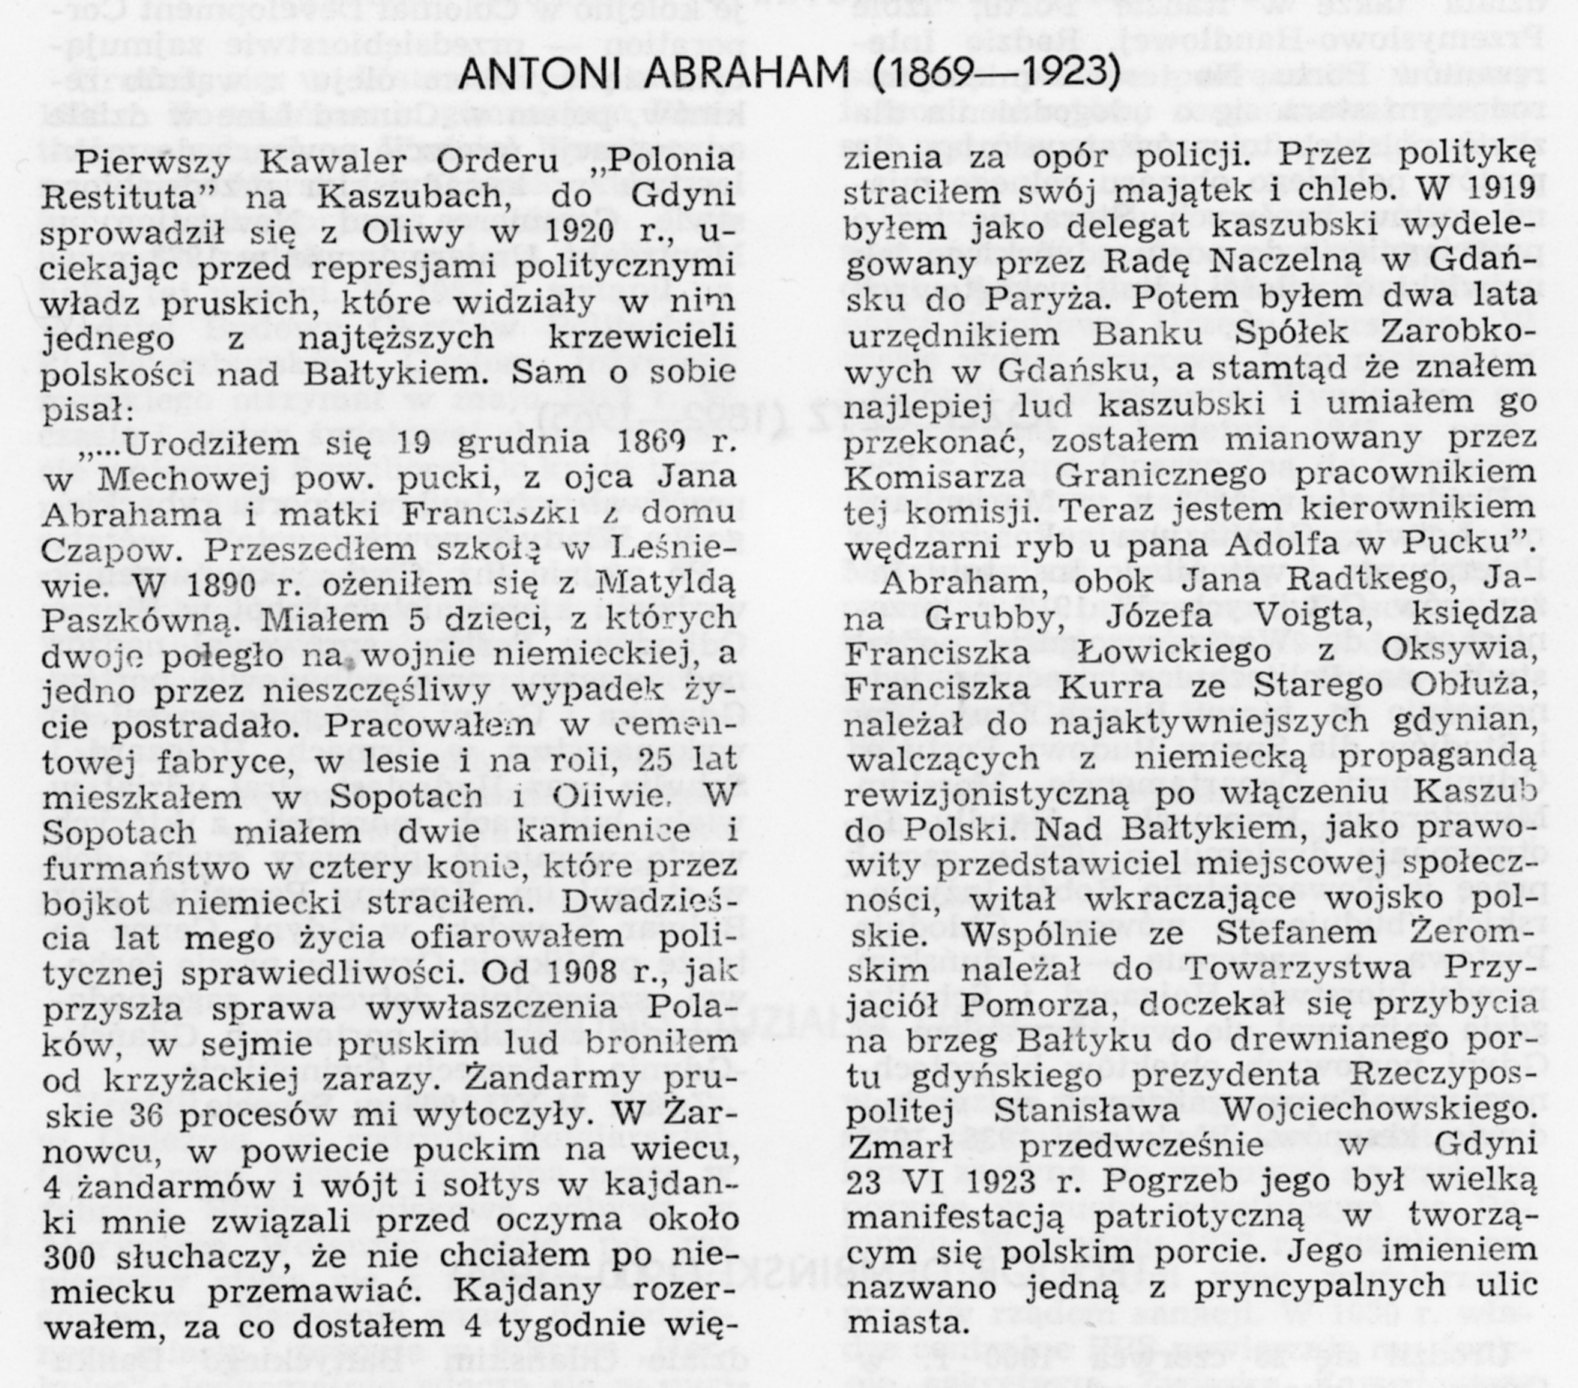 Antoni Abraham